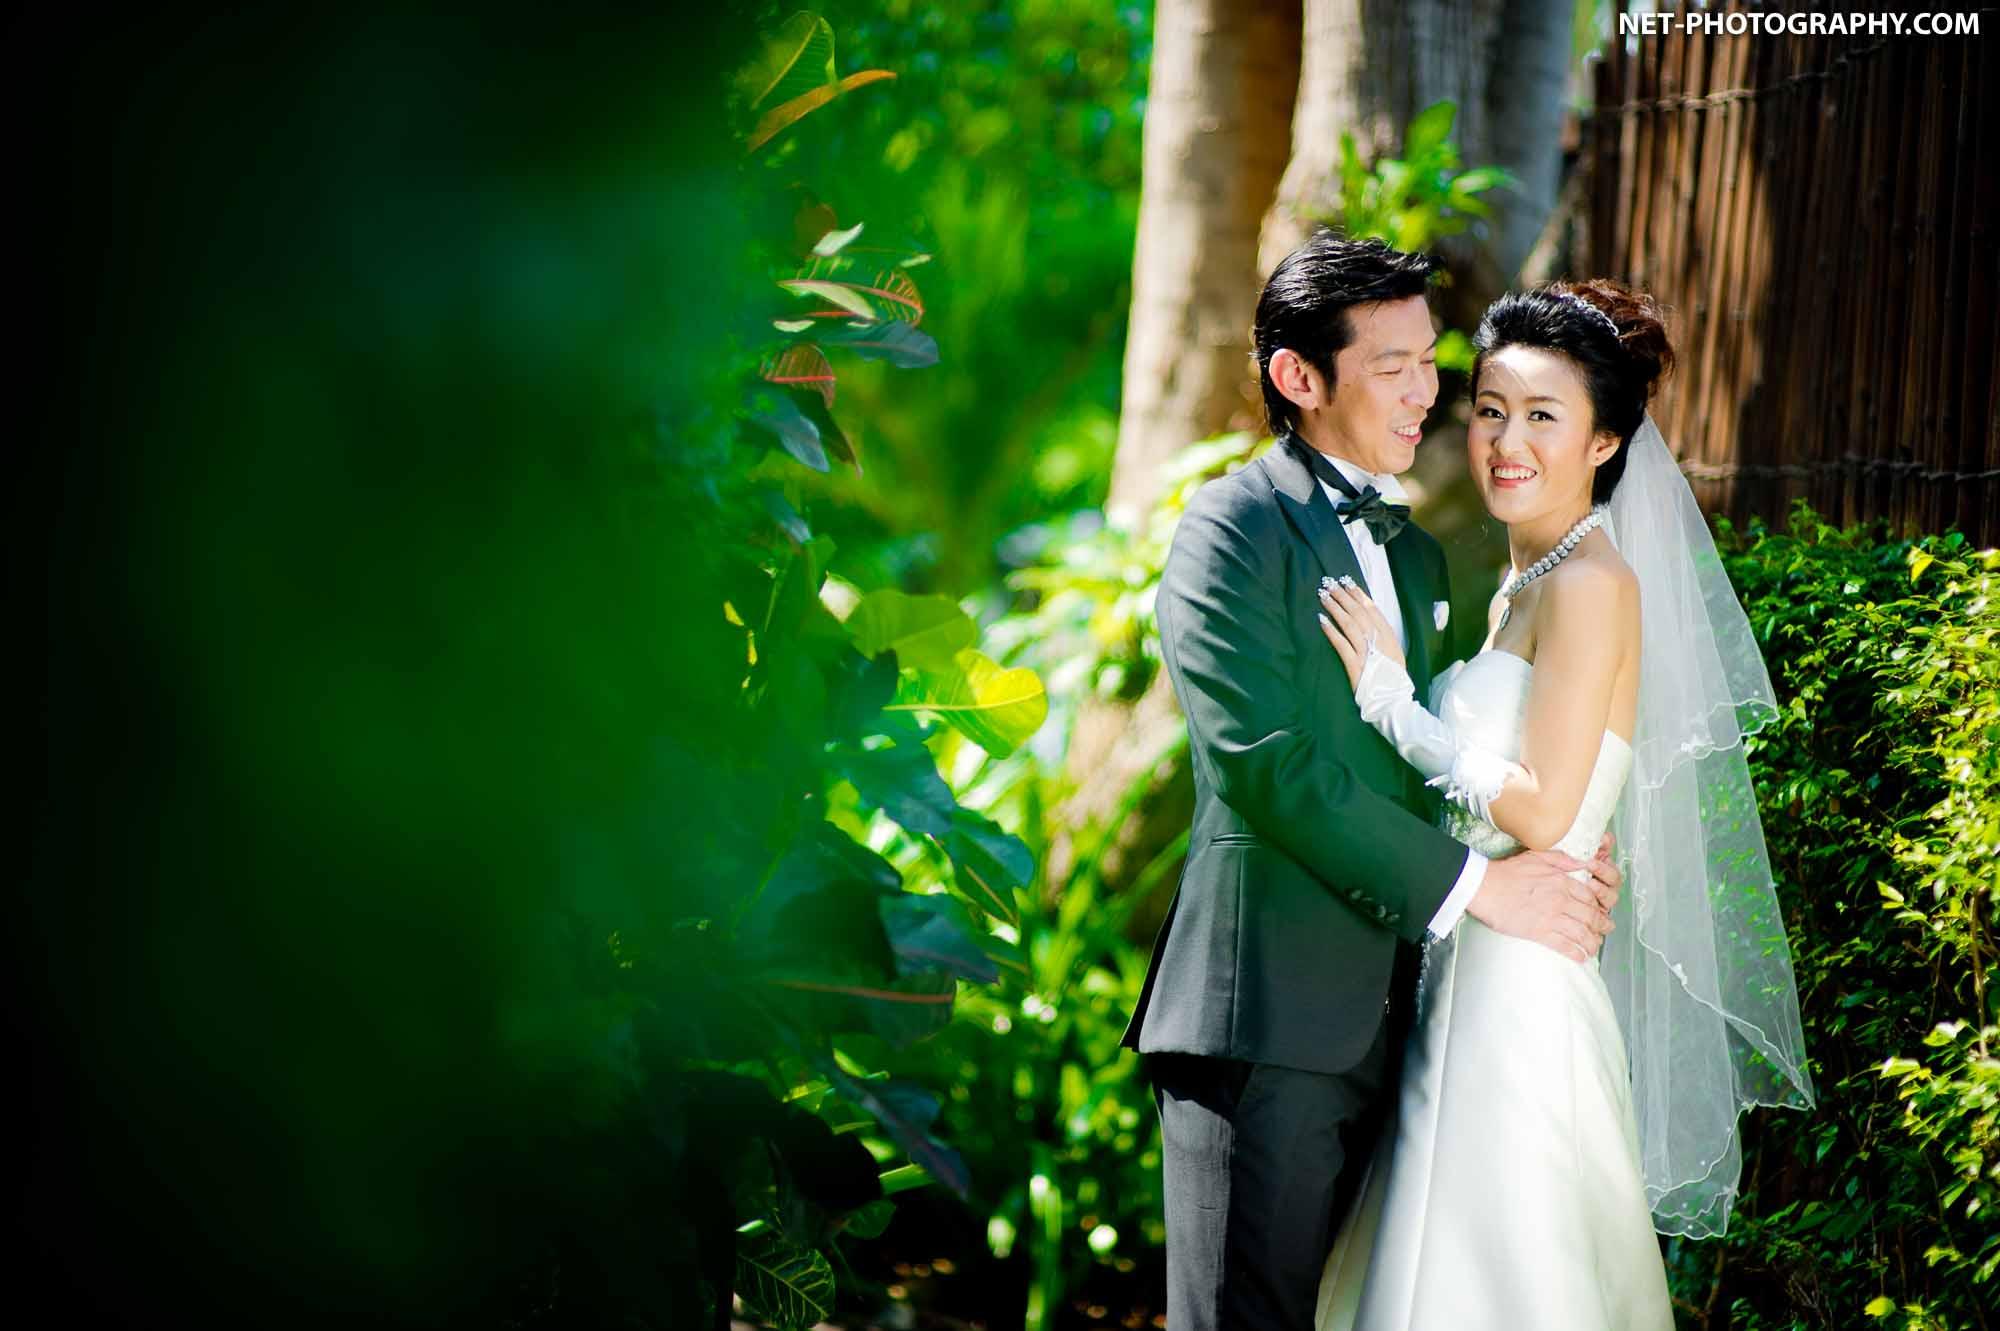 Aleenta Hua Hin Resort & Spa Thailand Wedding Photography